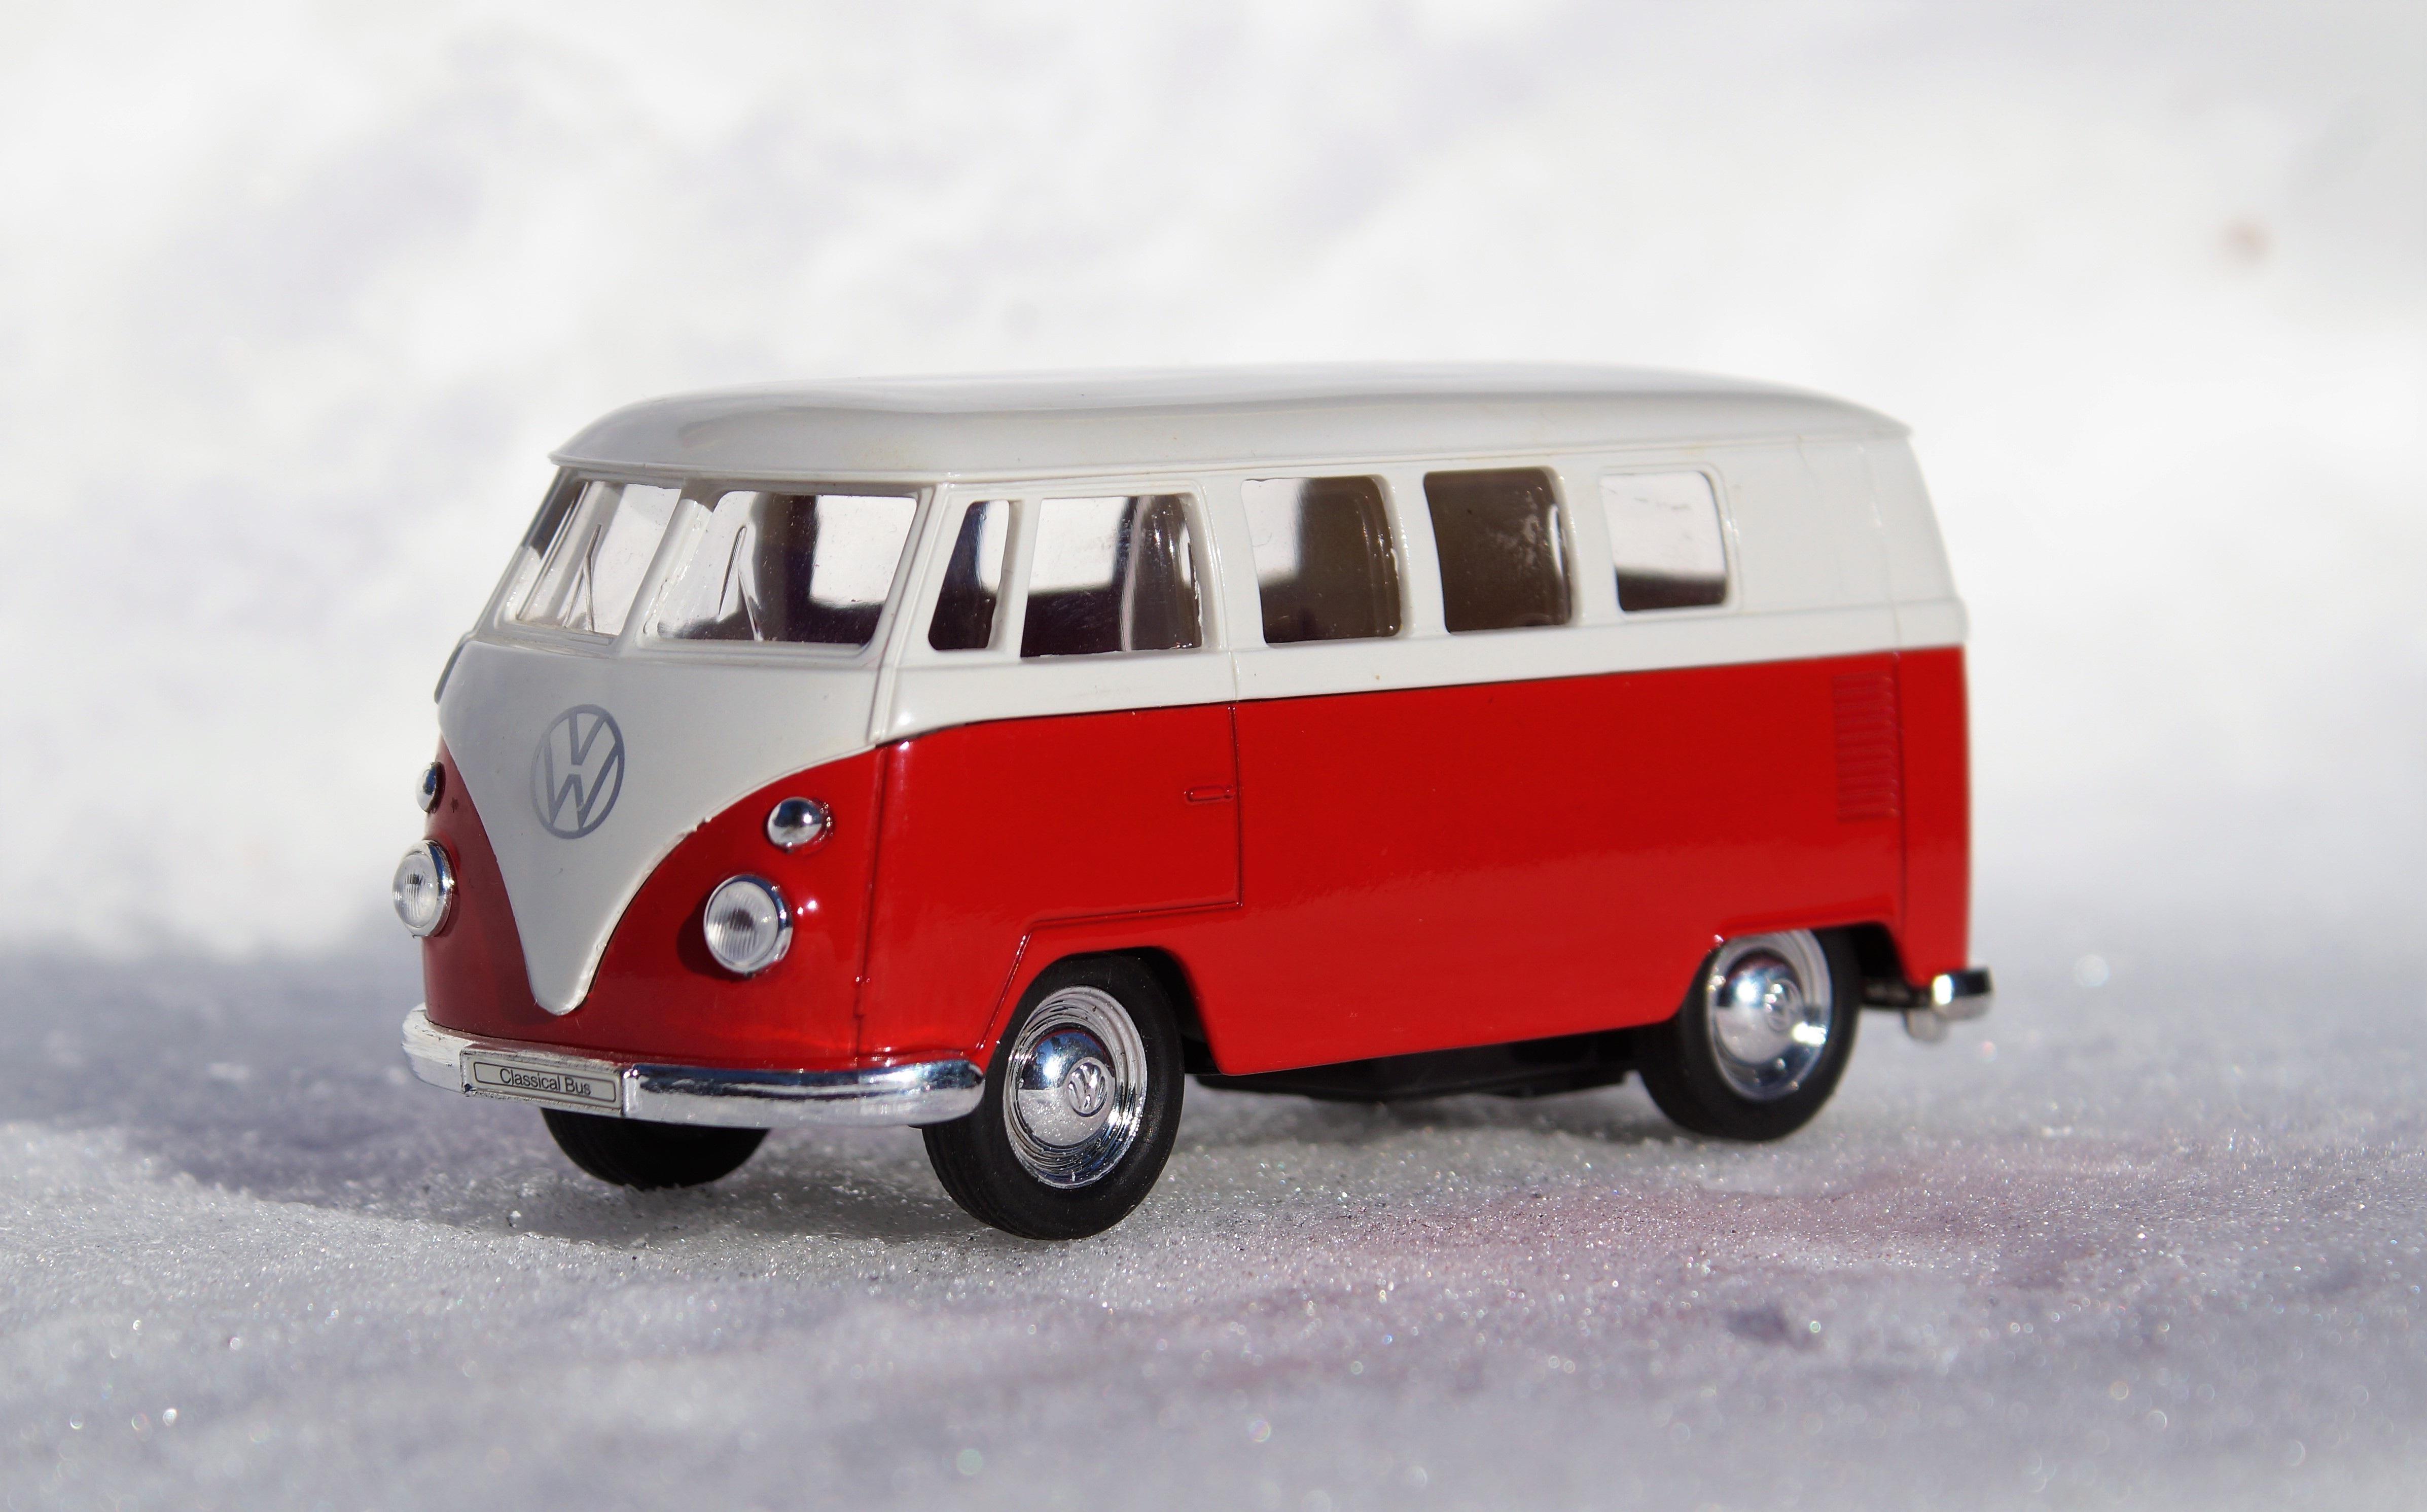 Free Images : vw, van, old, auto, automotive, bus, oldtimer, dare ...